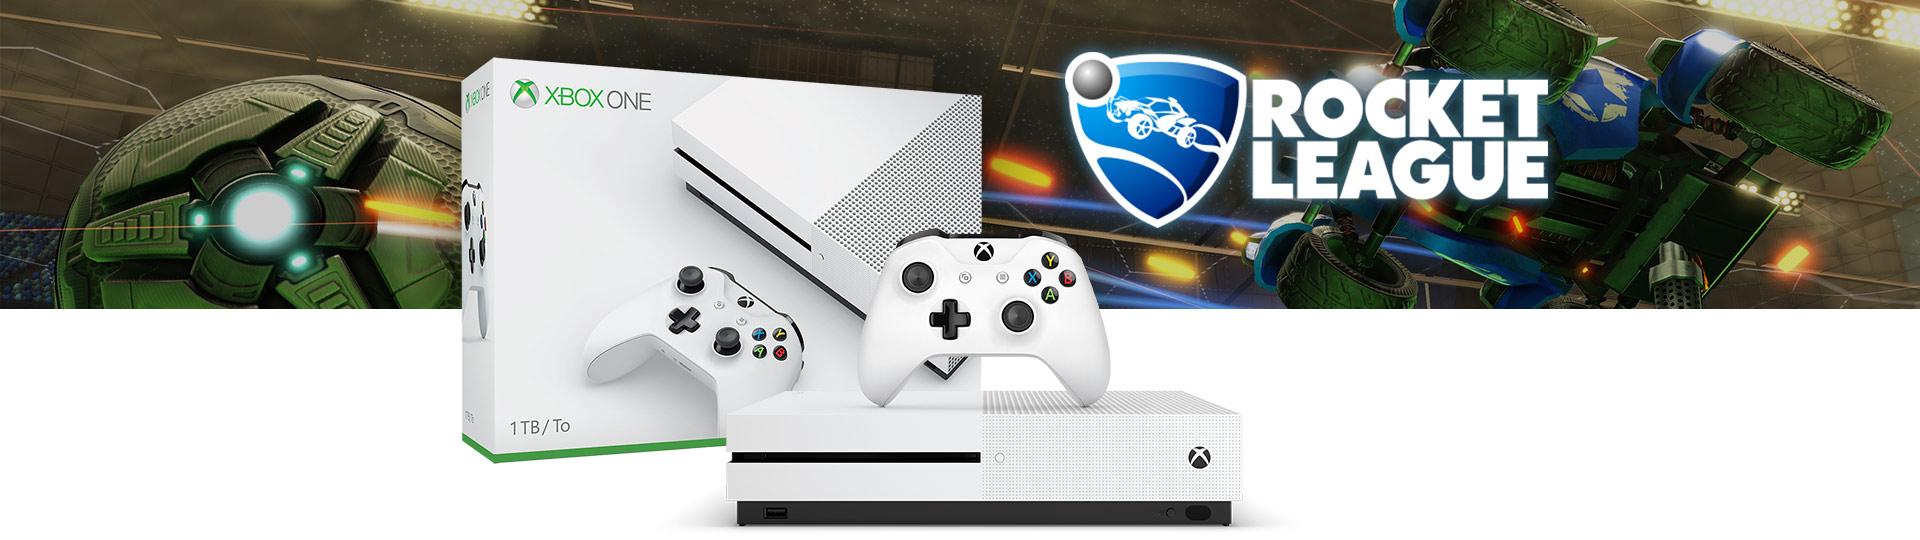 Xbox One S Rocket League Blast-Off Bundle 1TB